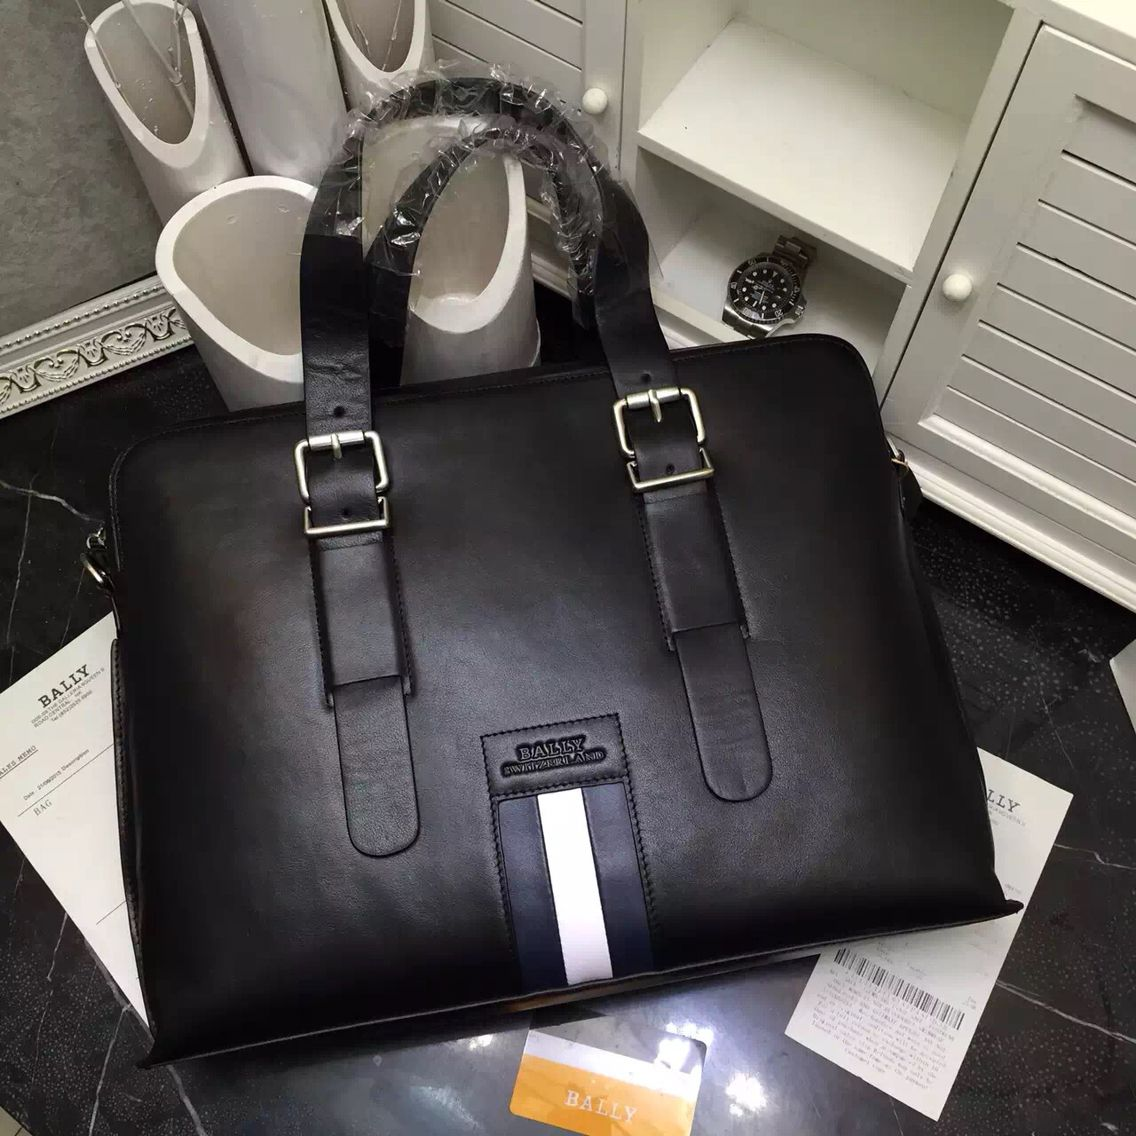 Bally men's handbag BIG SALE on gloluxshop